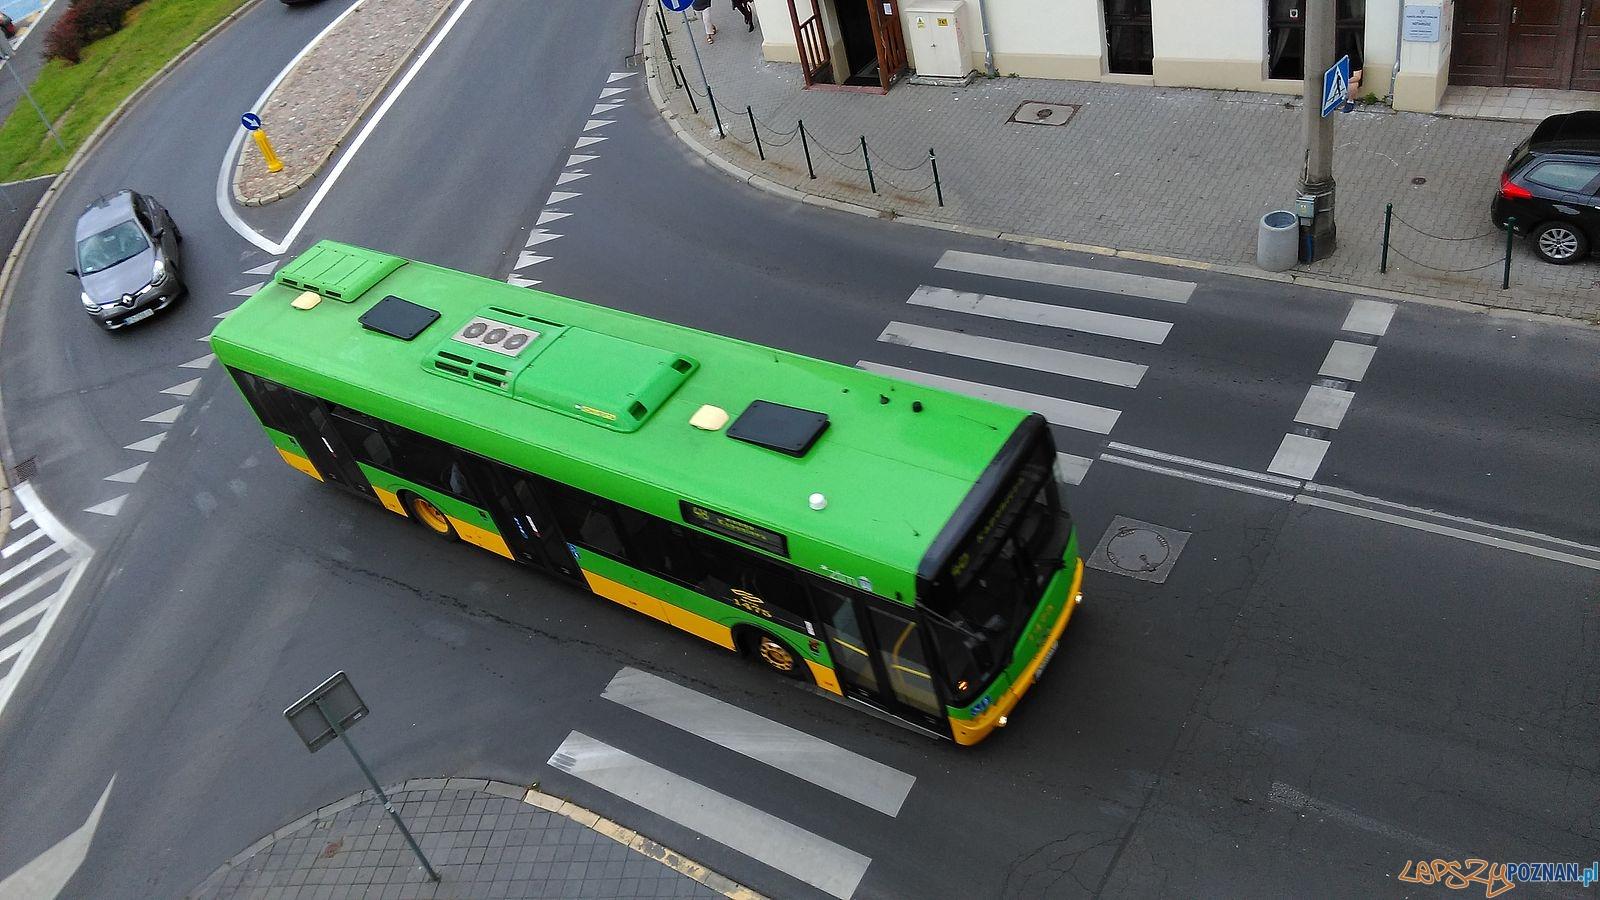 Autobus 48 Bukowska Zeylanda  Foto: lepszyPOZNAN / TD